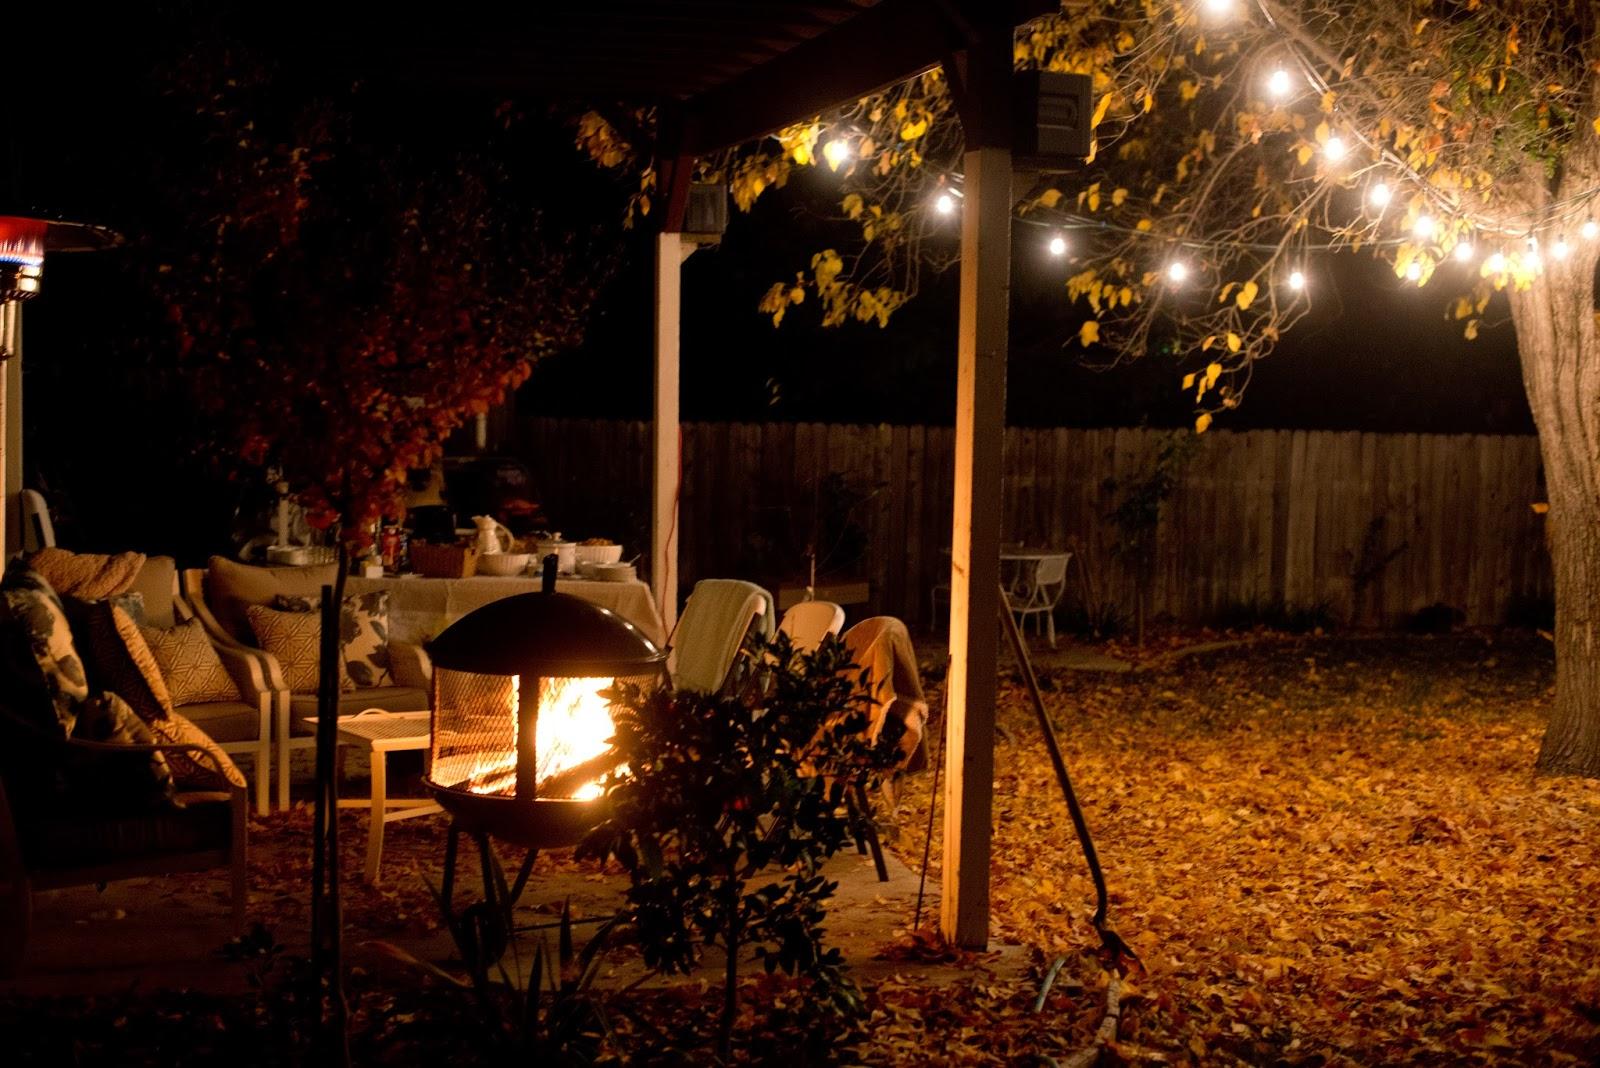 Nighttime Backyard Party : Backyard Party Night By the backyard fire pit